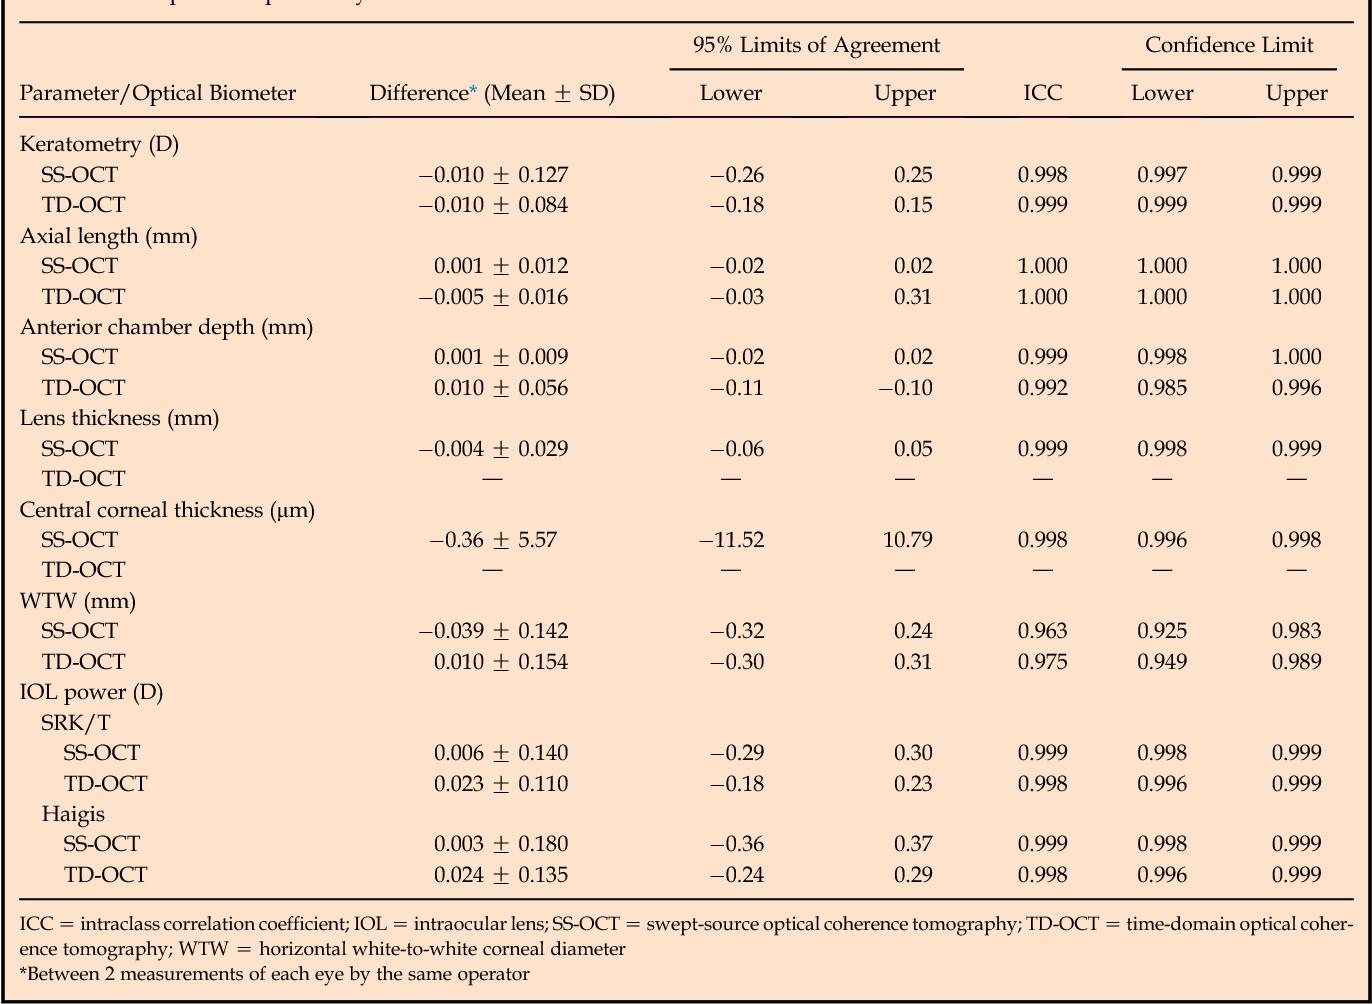 Table 3. Intraoperator repeatability measurements.